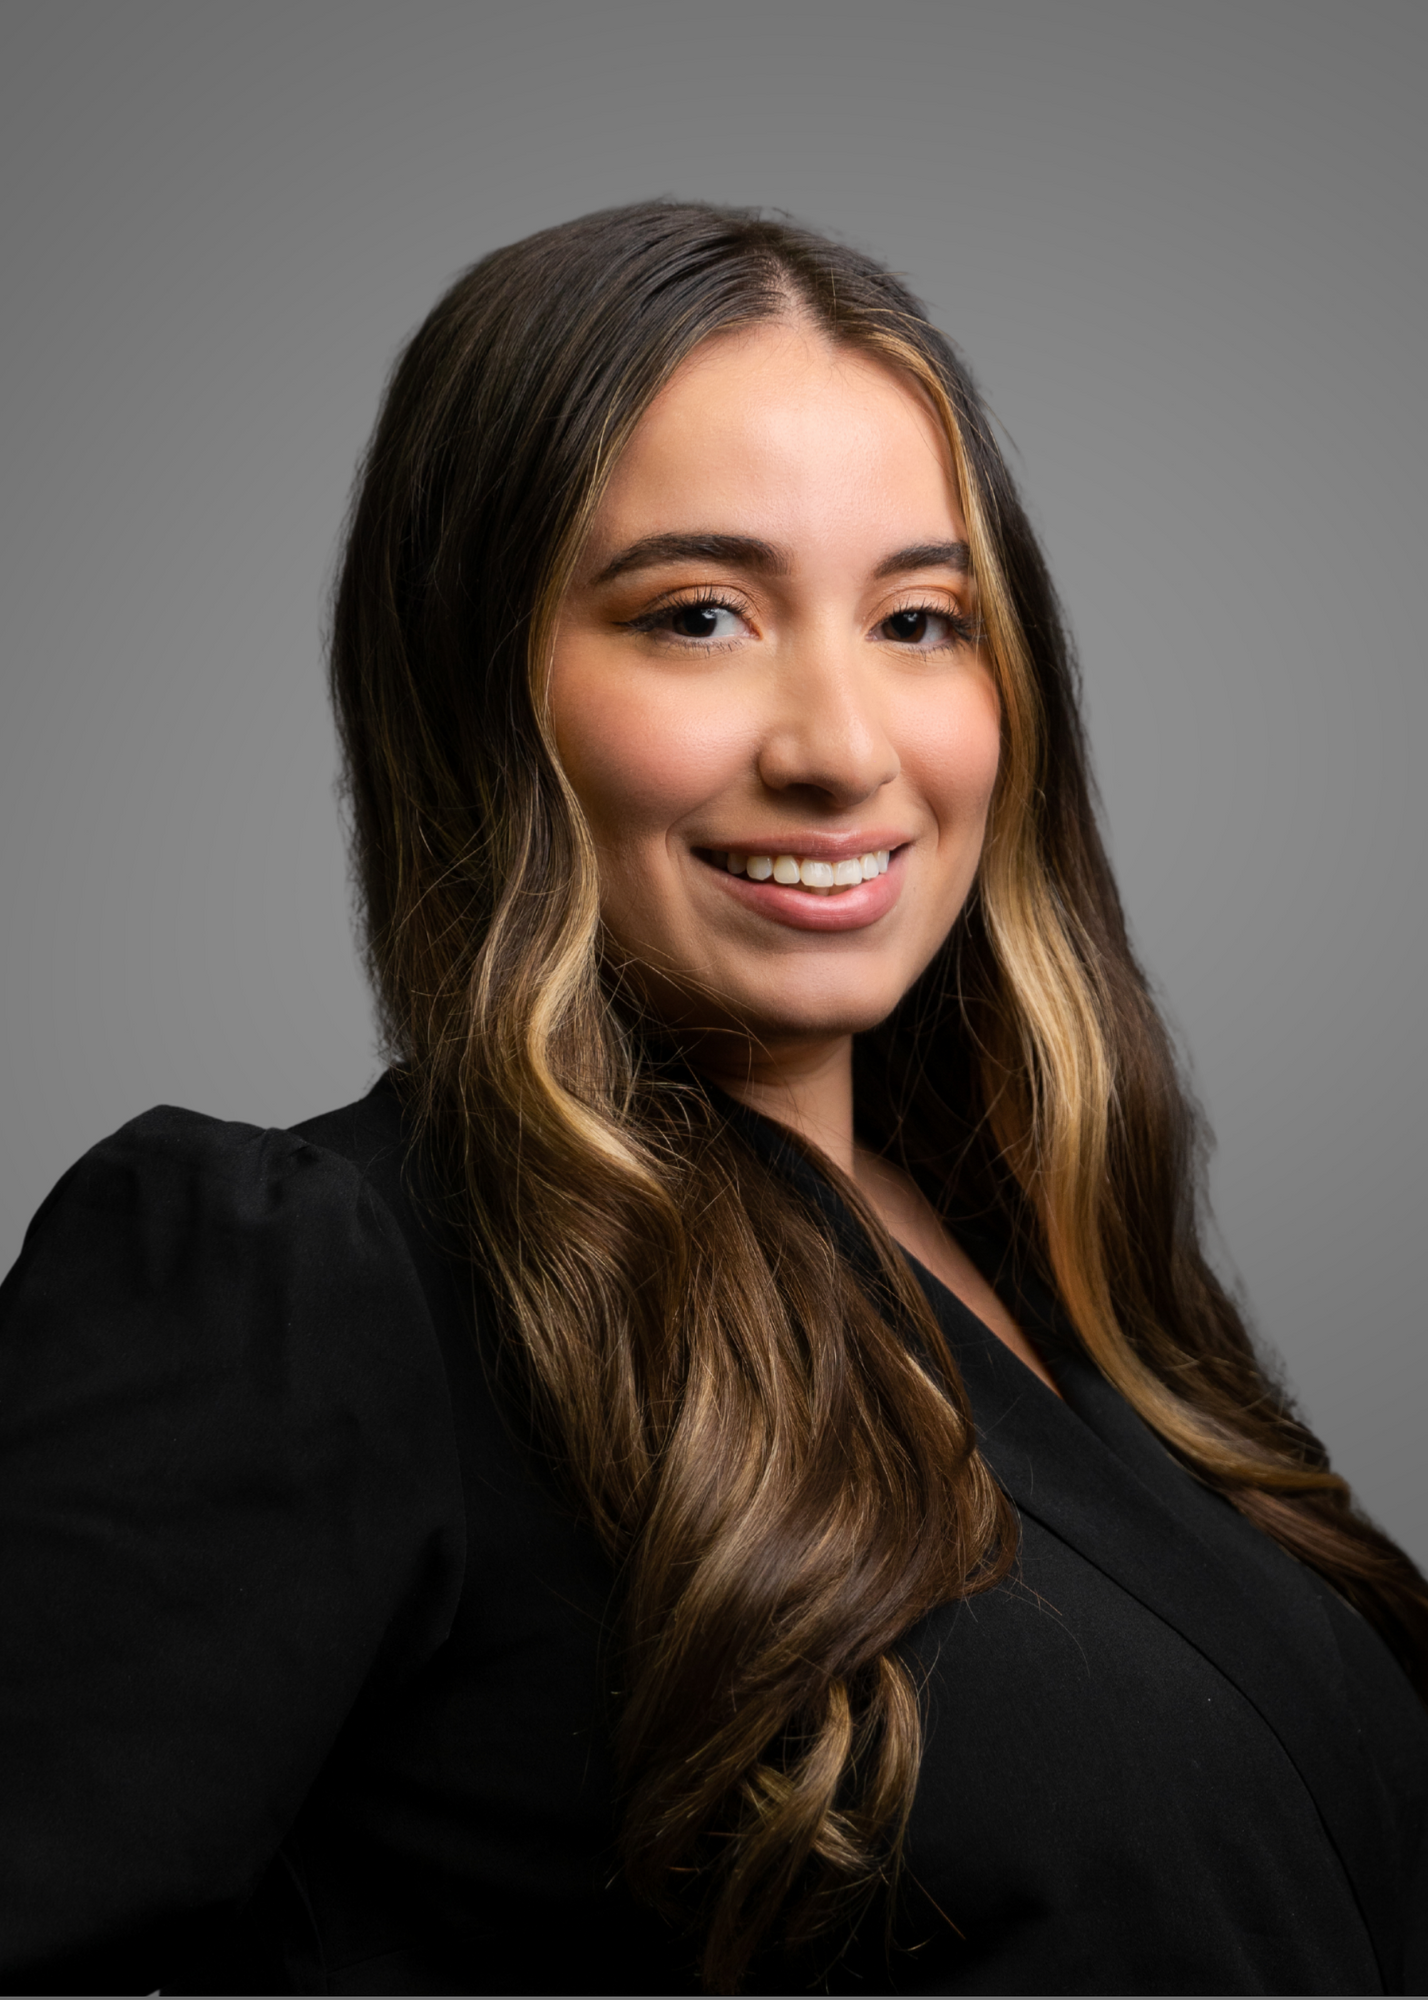 Malaina Ramirez